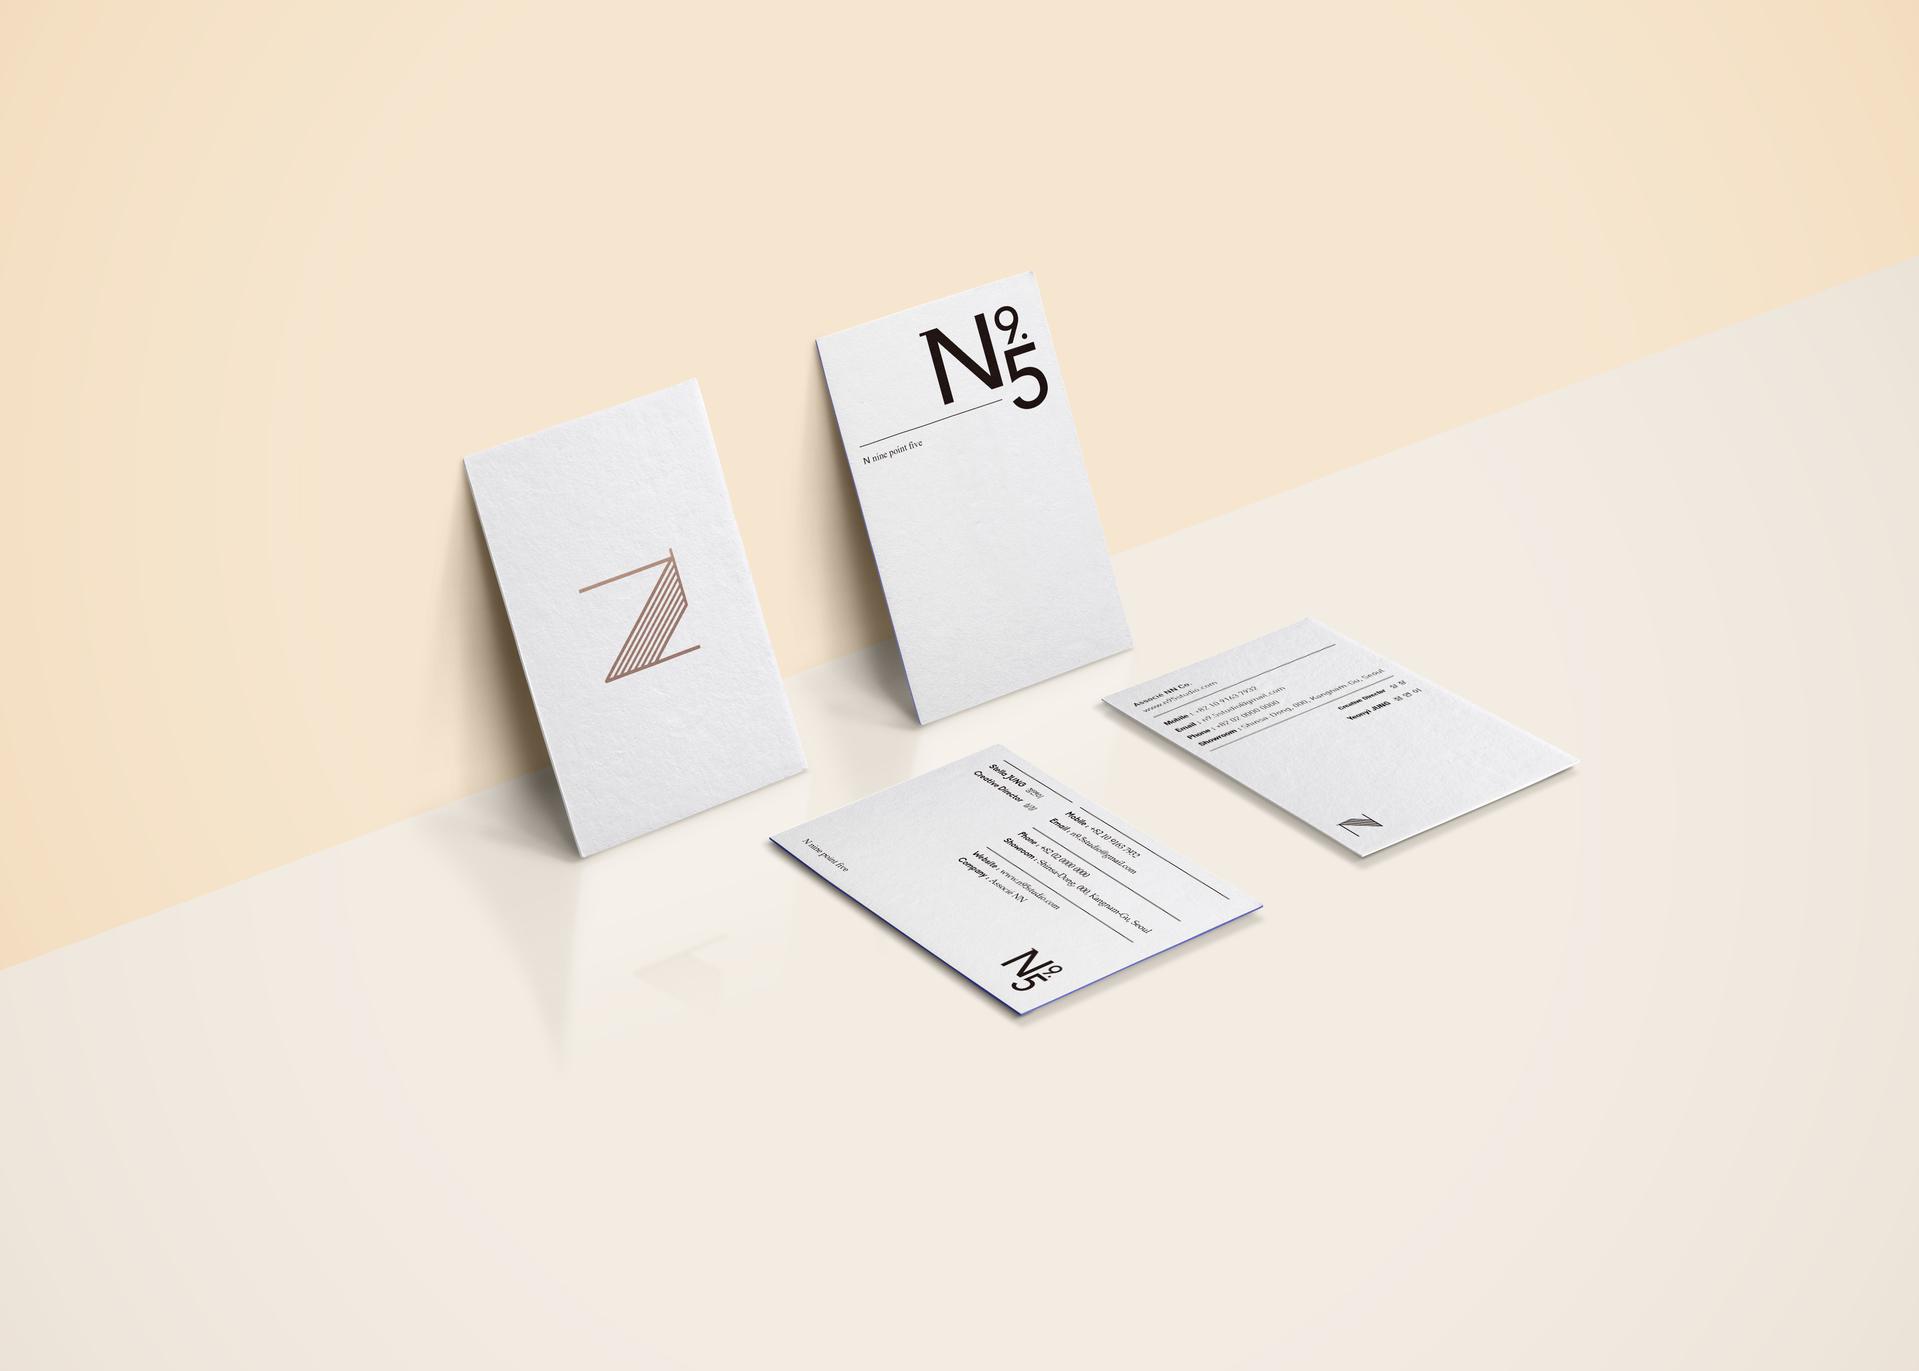 N9.5 / Identity Design